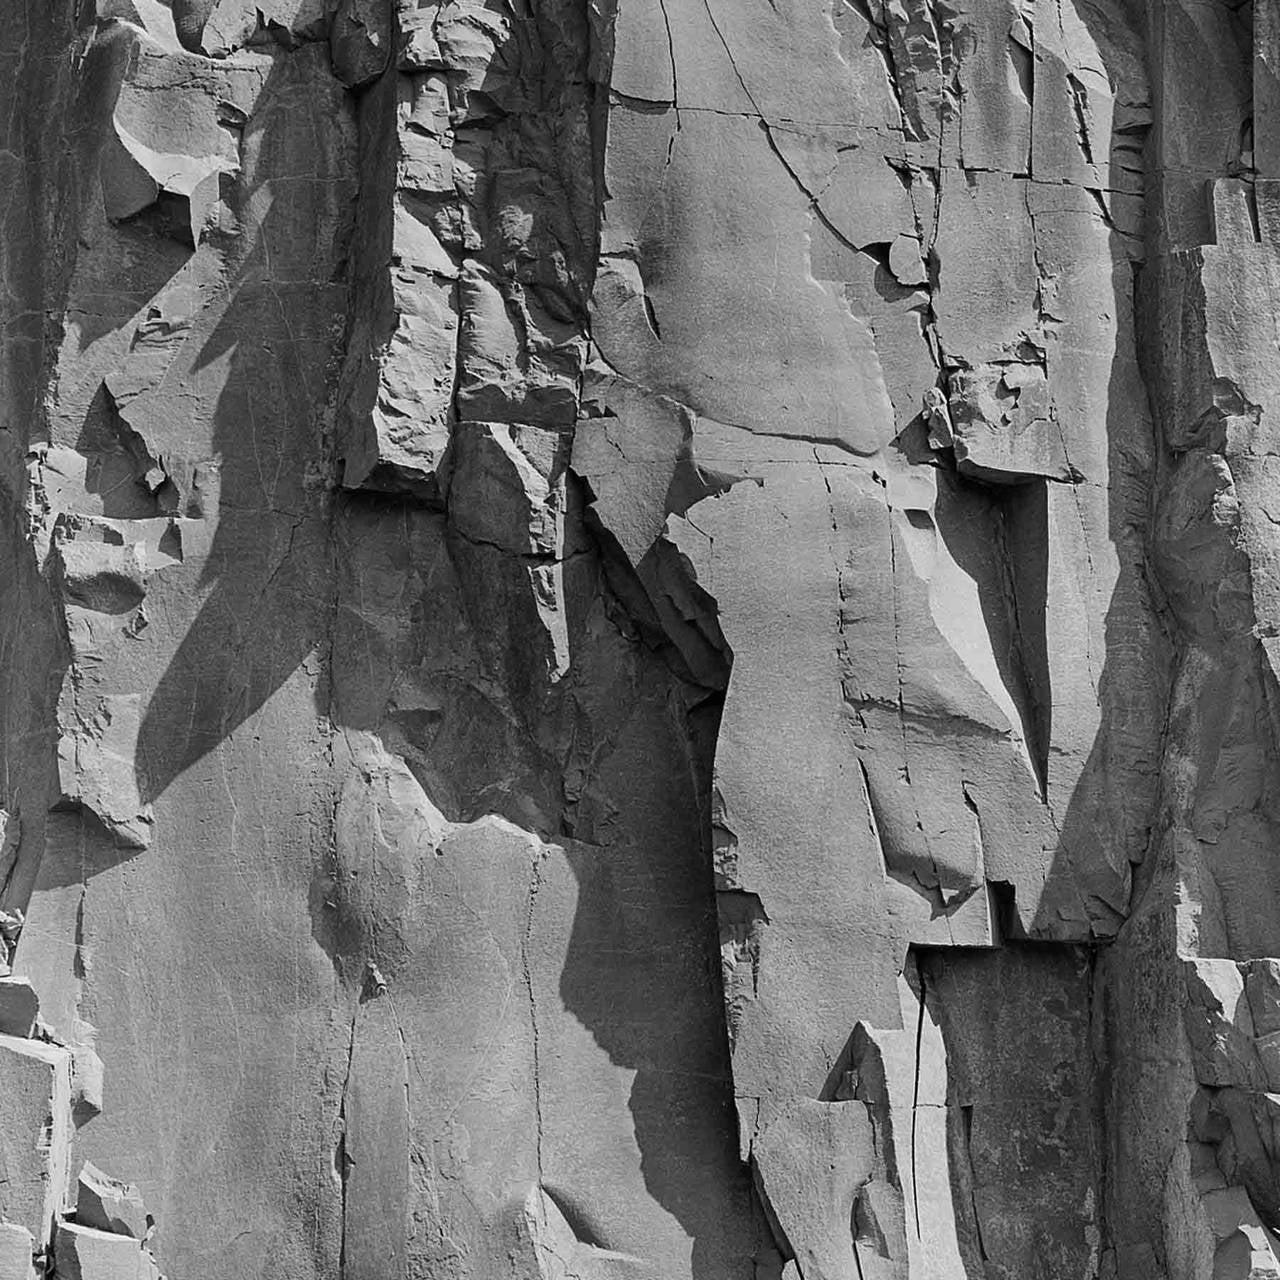 Andrew buck rockface 13 large square black white photograph